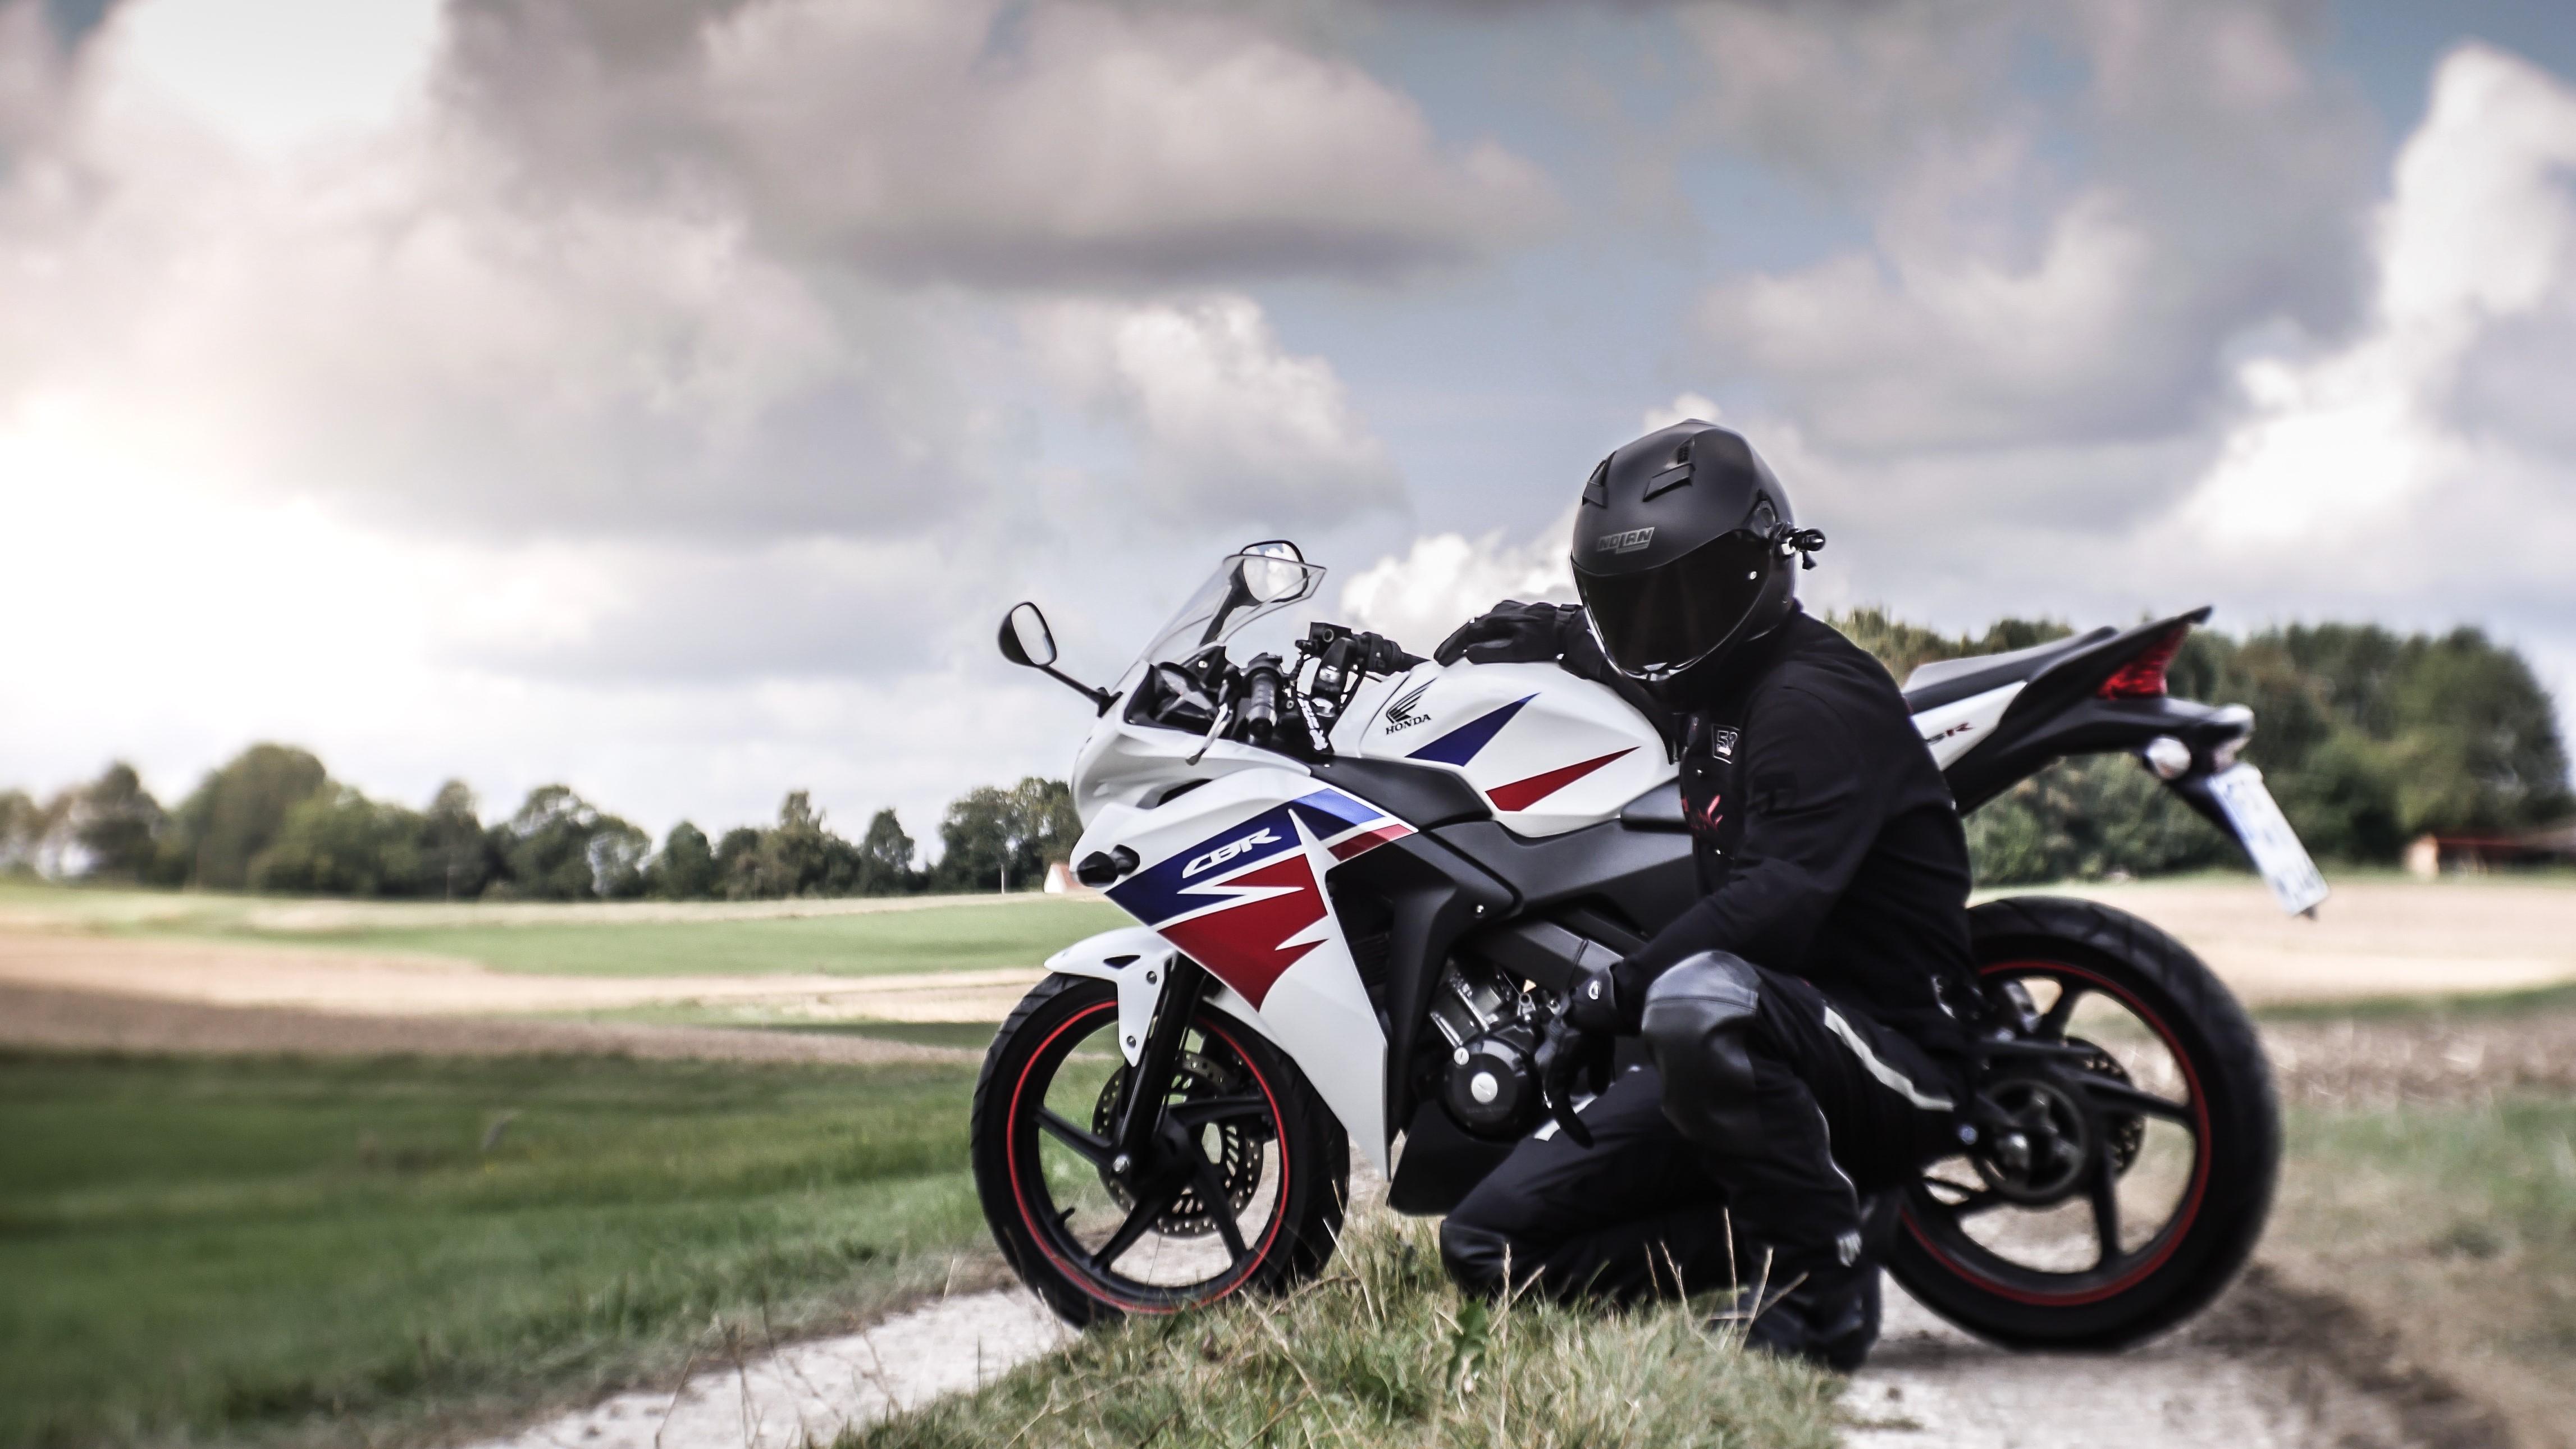 Motorcycle Honda Cbr125r 4k Ultra Hd Wallpaper Background Image 4588x2581 Id 943268 Wallpaper Abyss